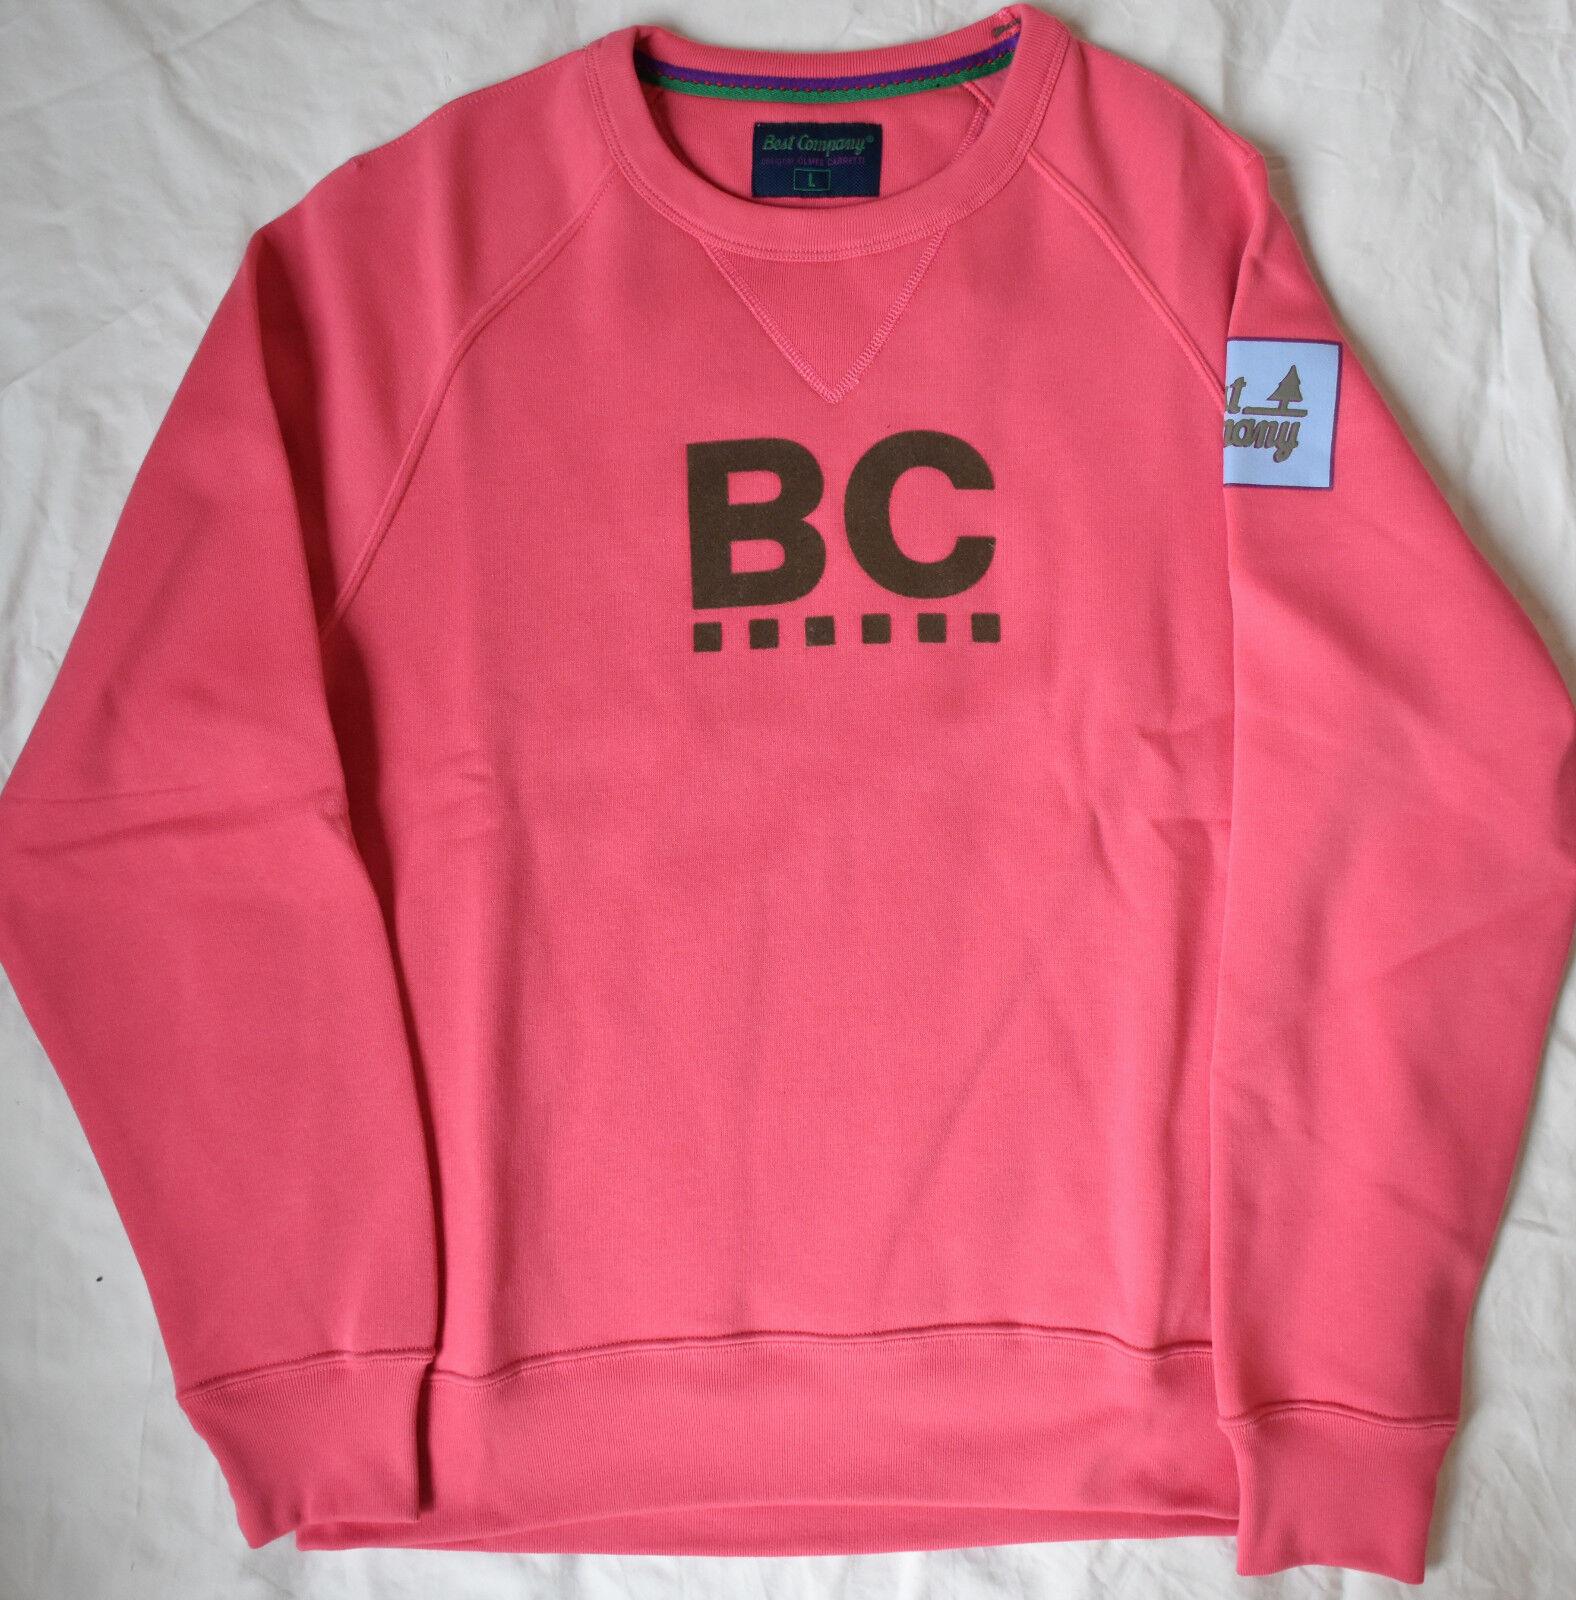 Best Company 1982 Felpa Girocollo Raglan 692006 in pink Various Sizes